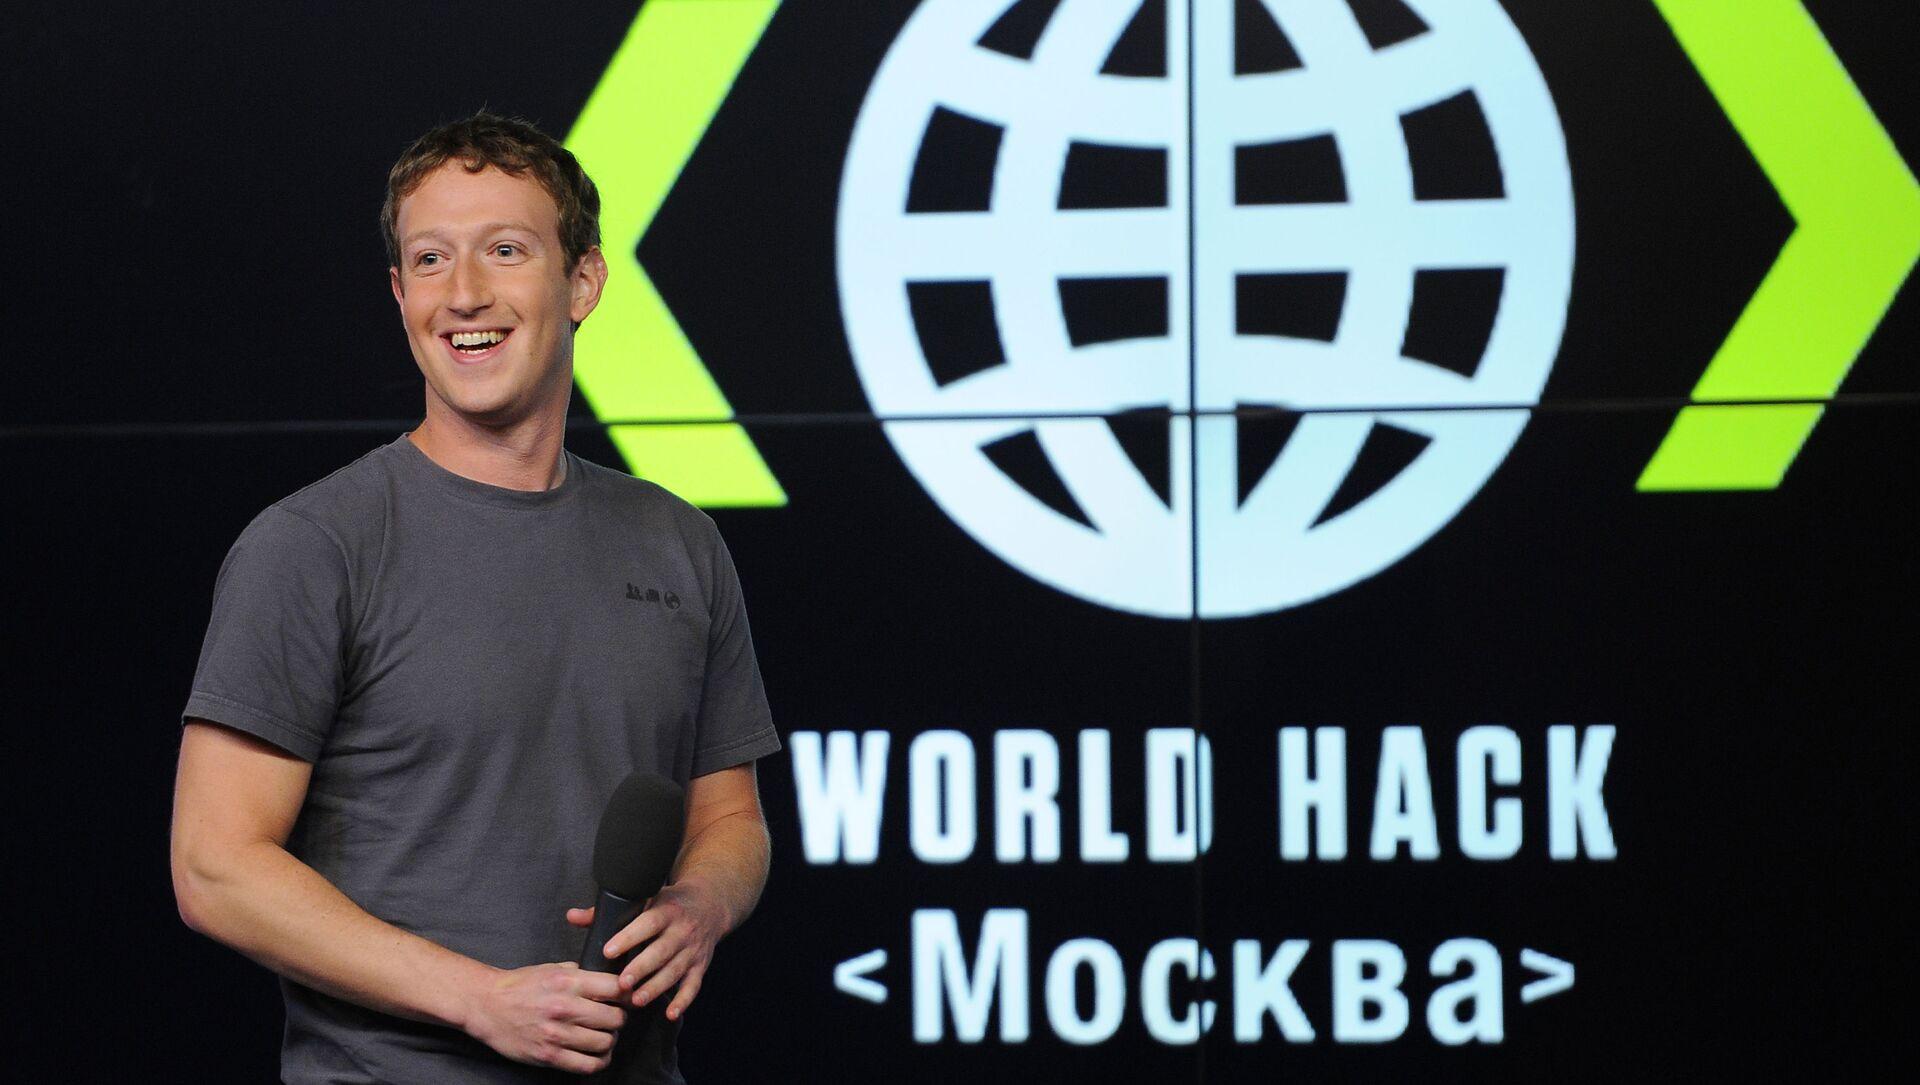 Osnivač Fejsbuka Mark Zakerberg na konferenciji u Moskvi - Sputnik Srbija, 1920, 03.02.2021